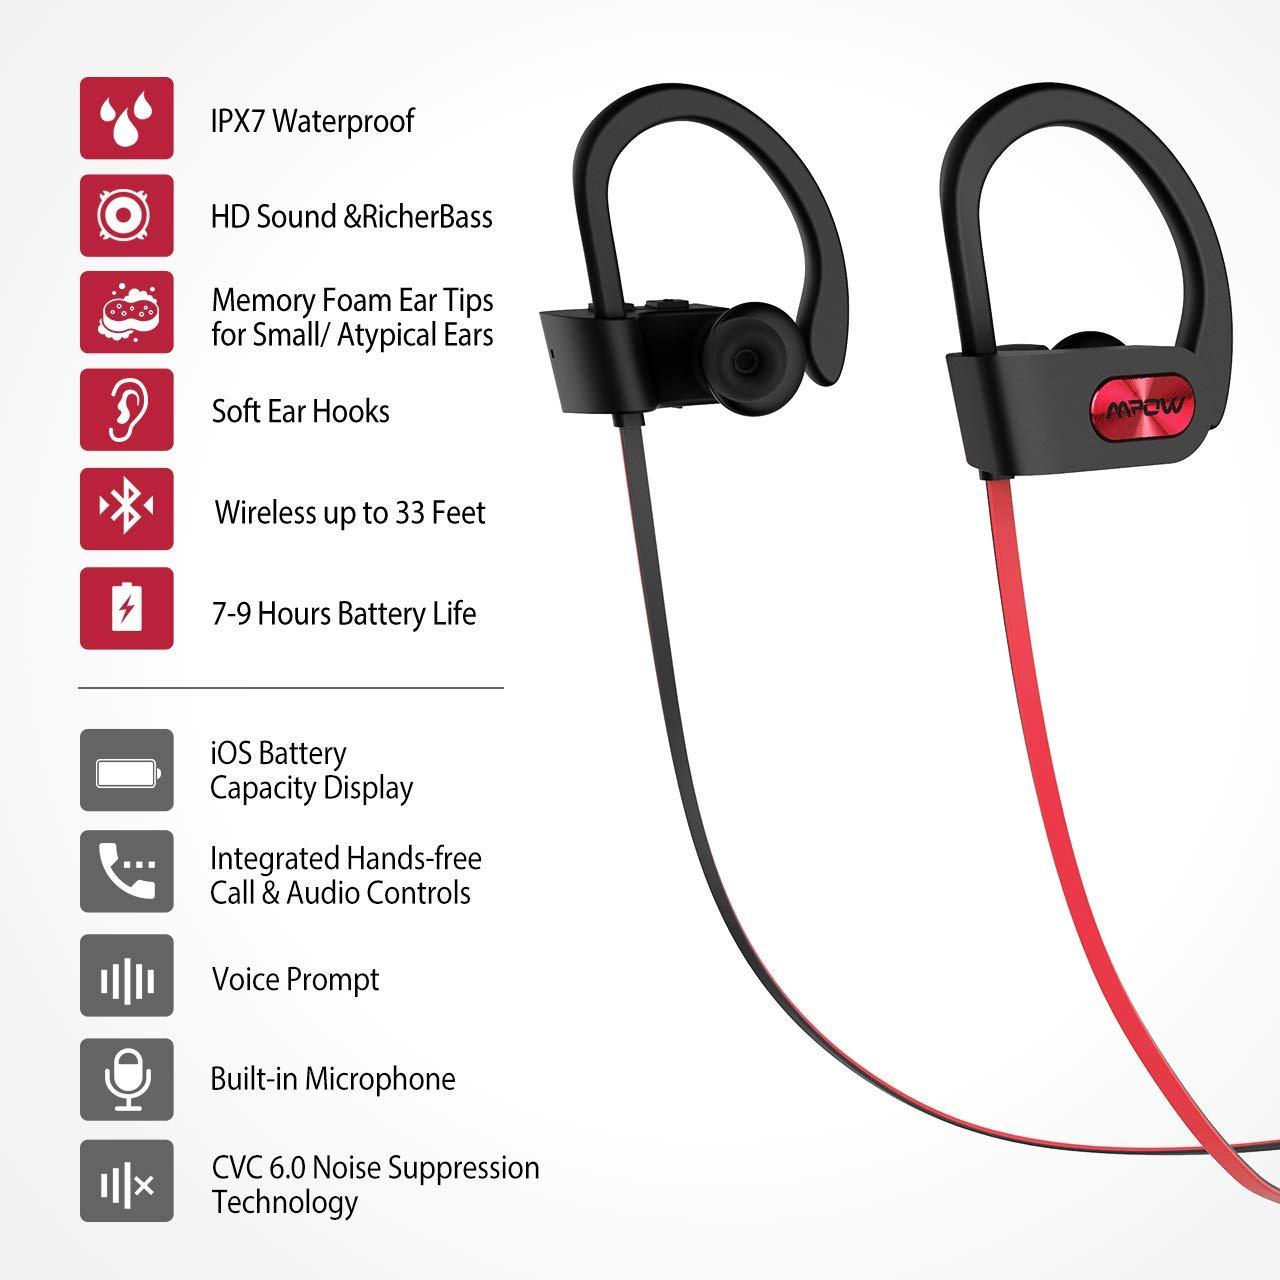 e7f081d315e Amazon.com: Mpow Flame Upgraded Bluetooth Headphones with Case, IPX7  Waterproof Wireless Earphones Sport W/Mic, 7-9 Hrs Playtime, in-Ear Wireless  Earbuds ...